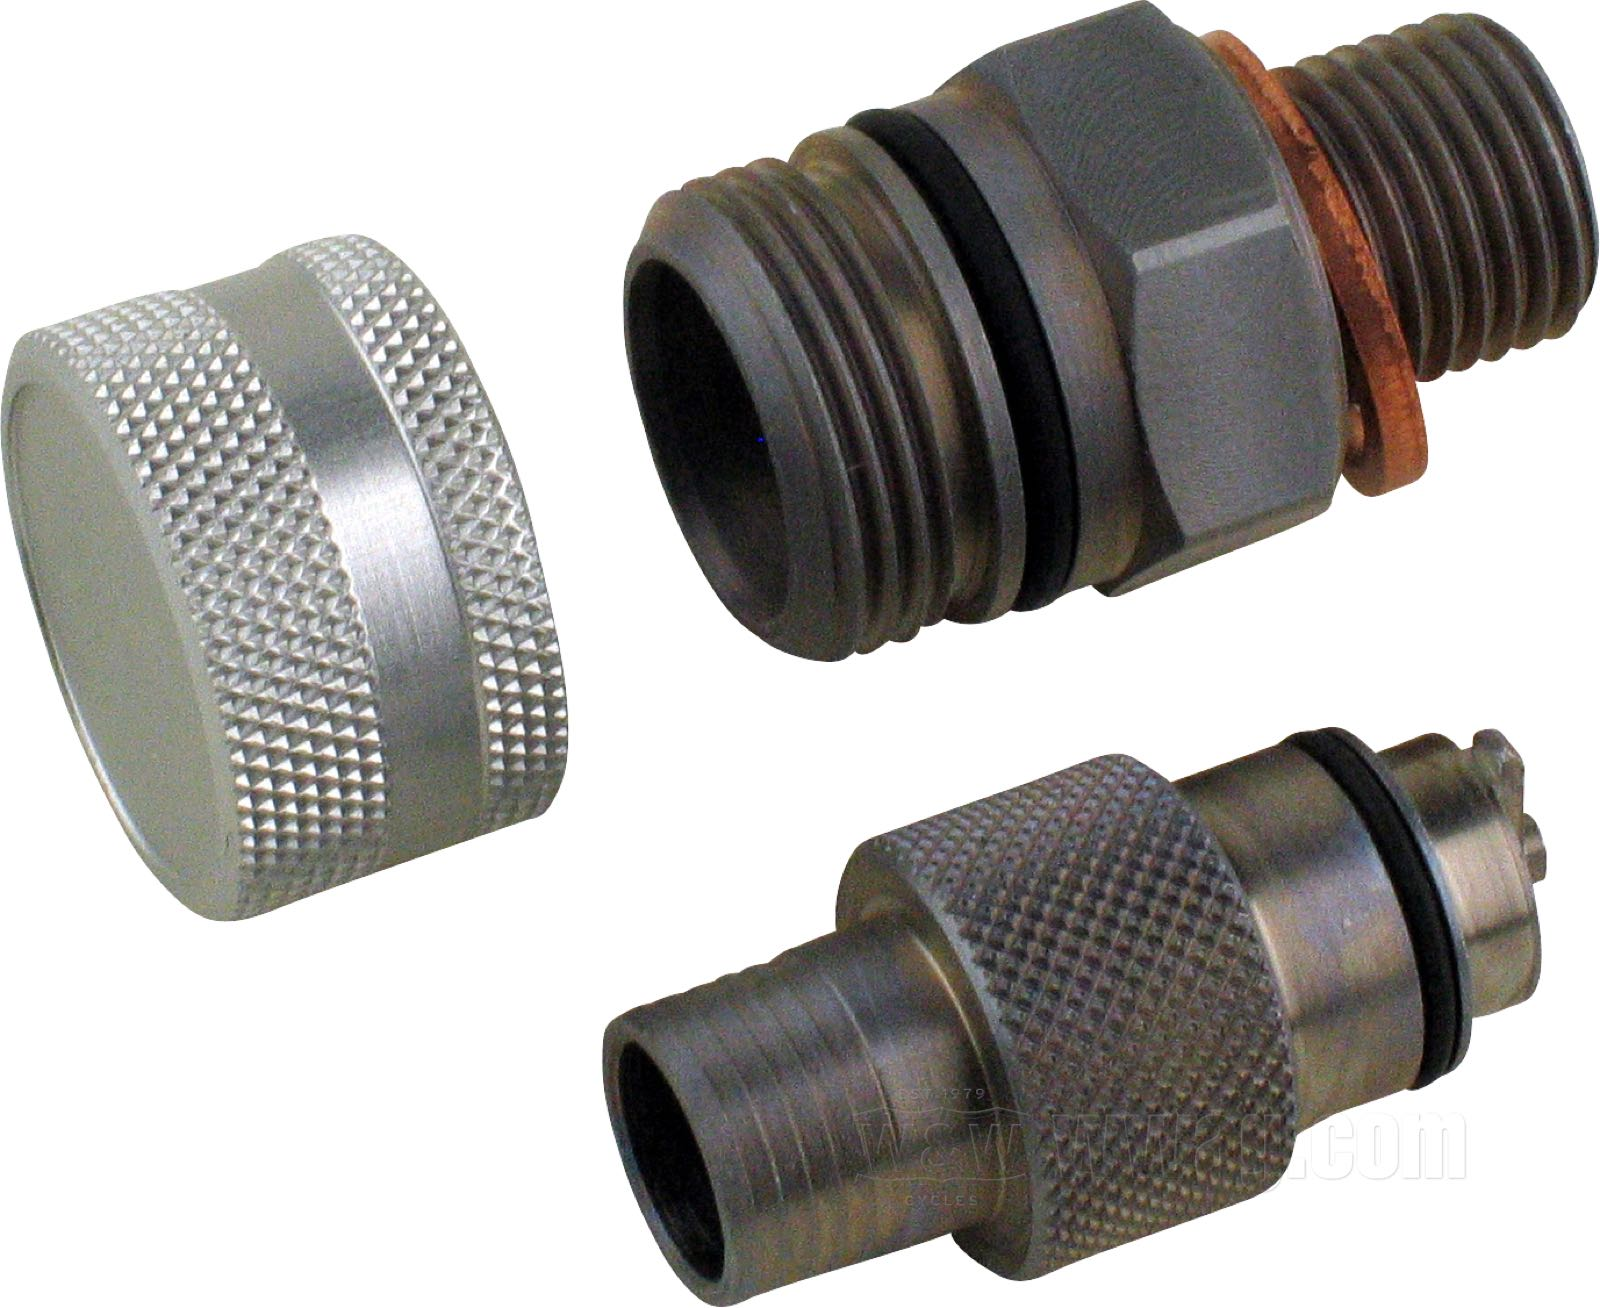 de acero. Stahlbus Tap/ón de V/álvula de drenaje de aceite